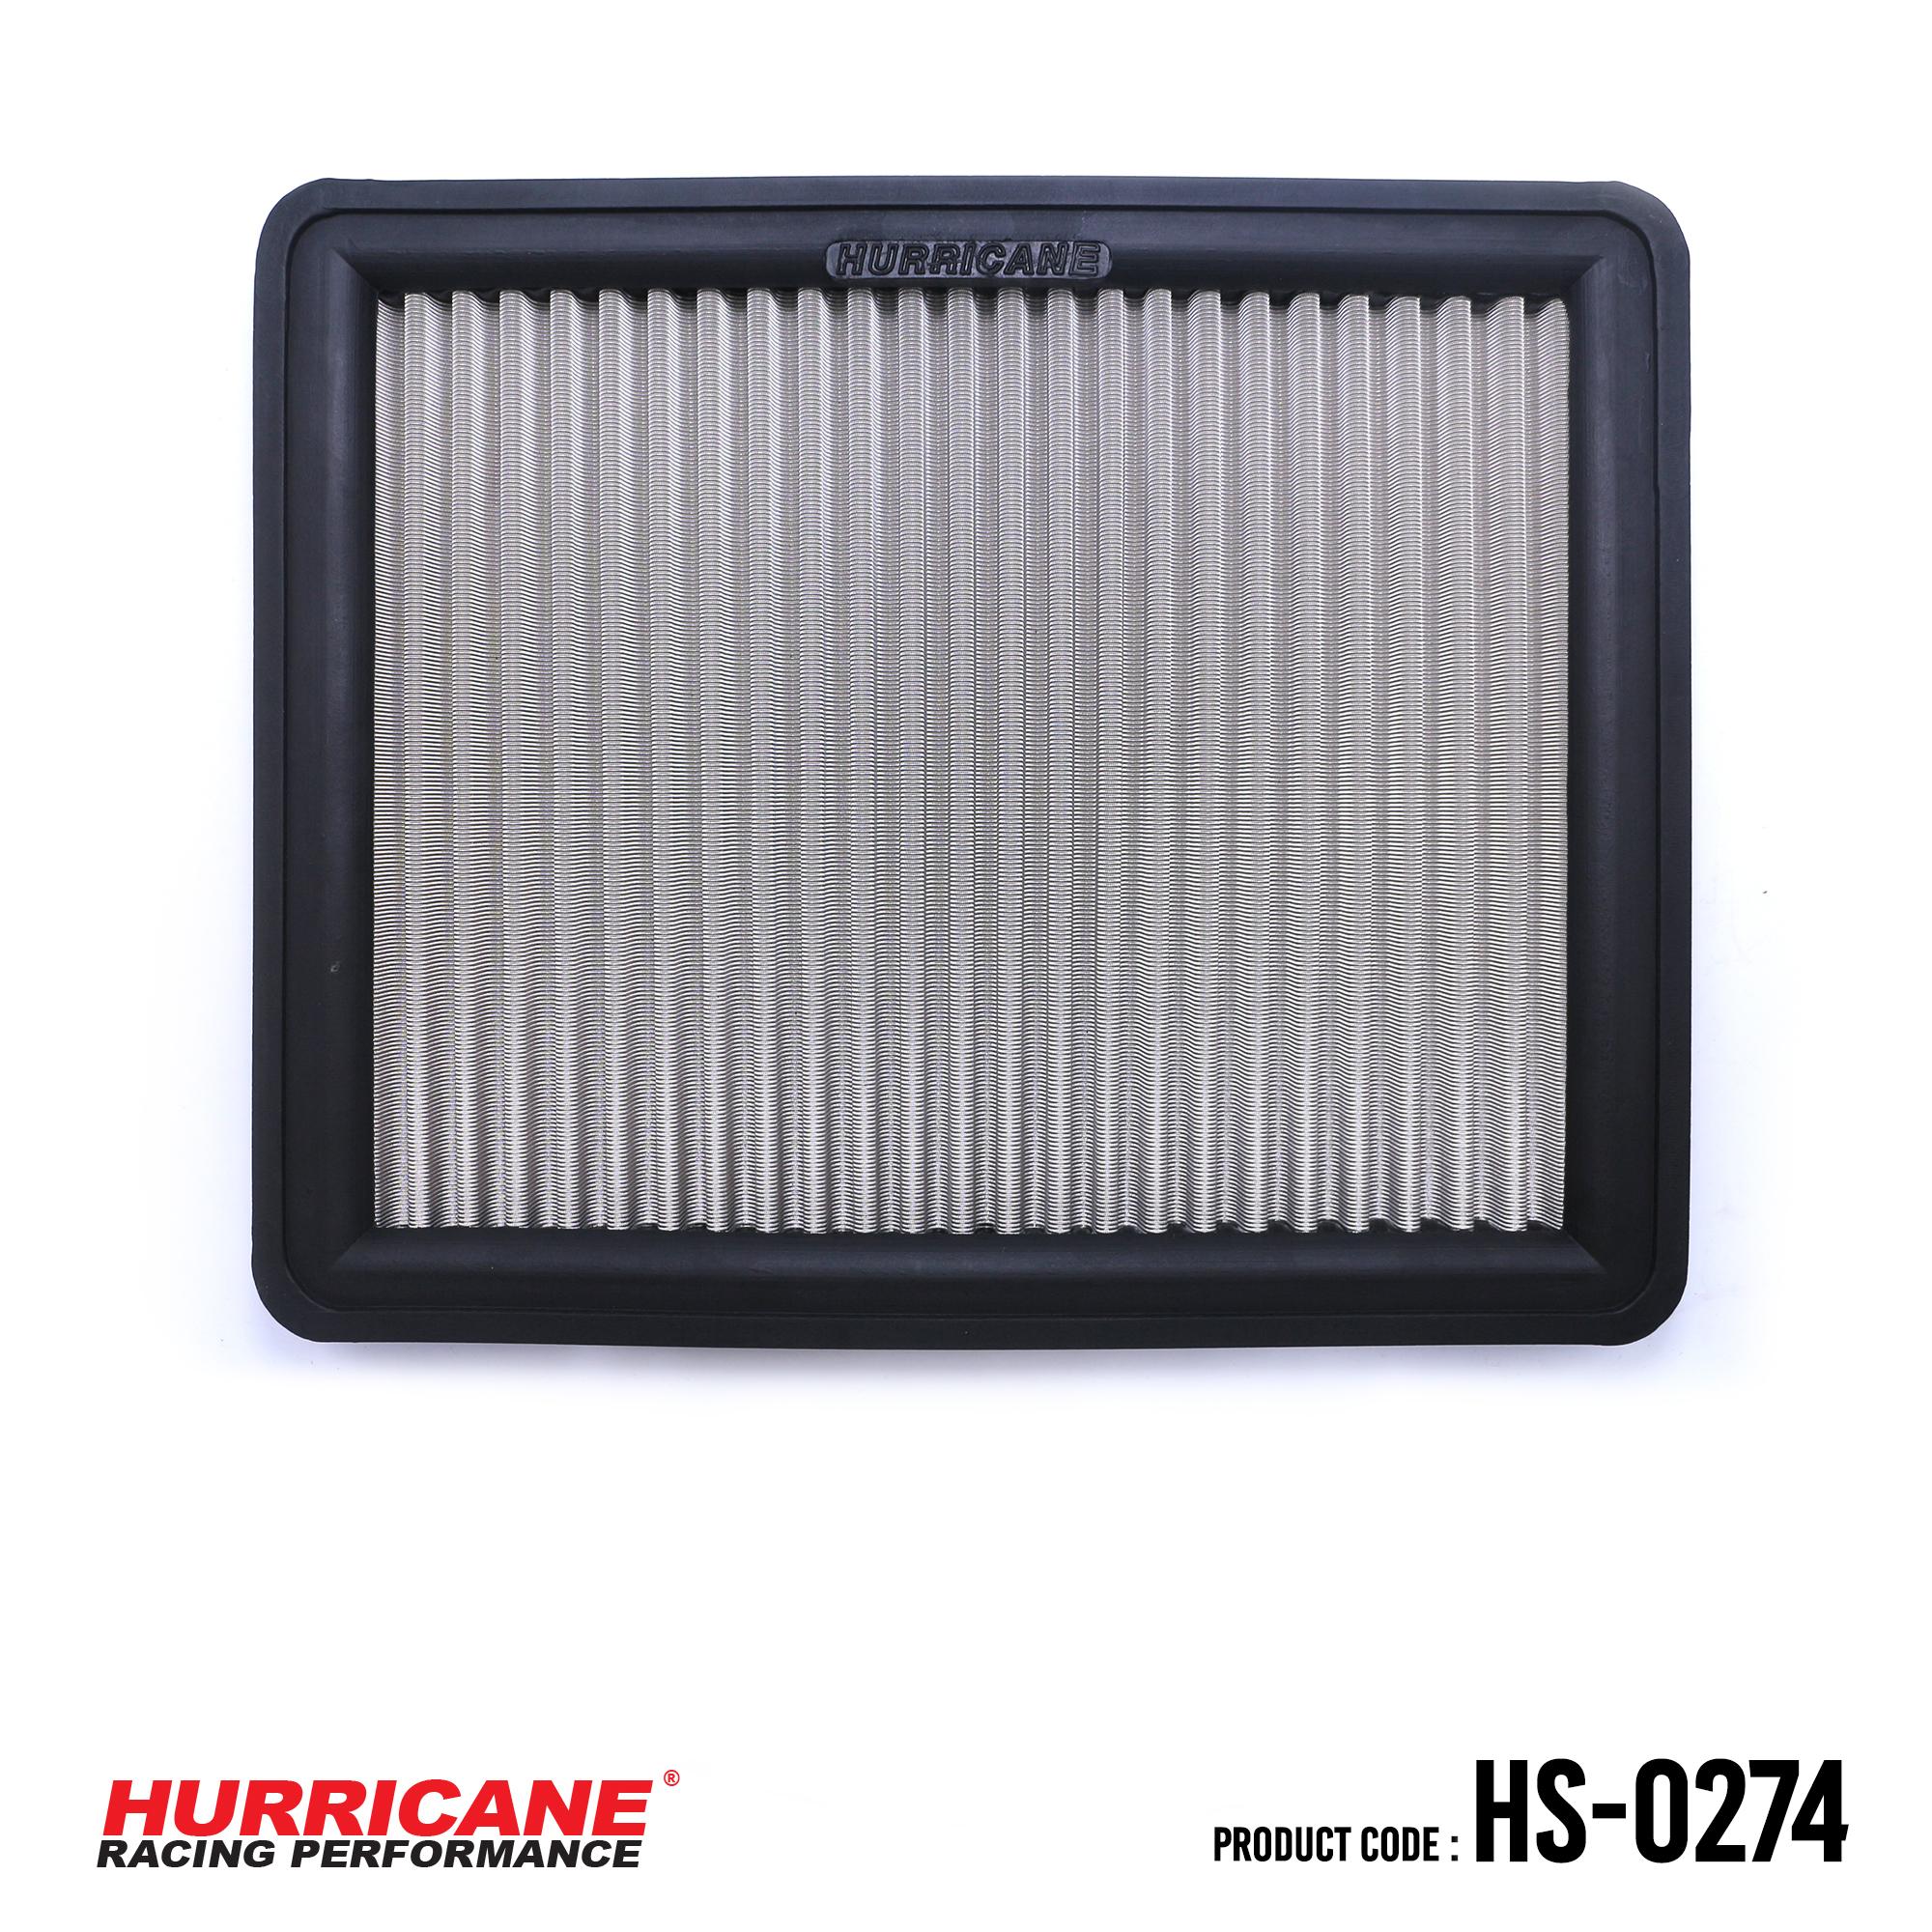 HURRICANE STAINLESS STEEL AIR FILTER FOR HS-0274 HyundaiKia